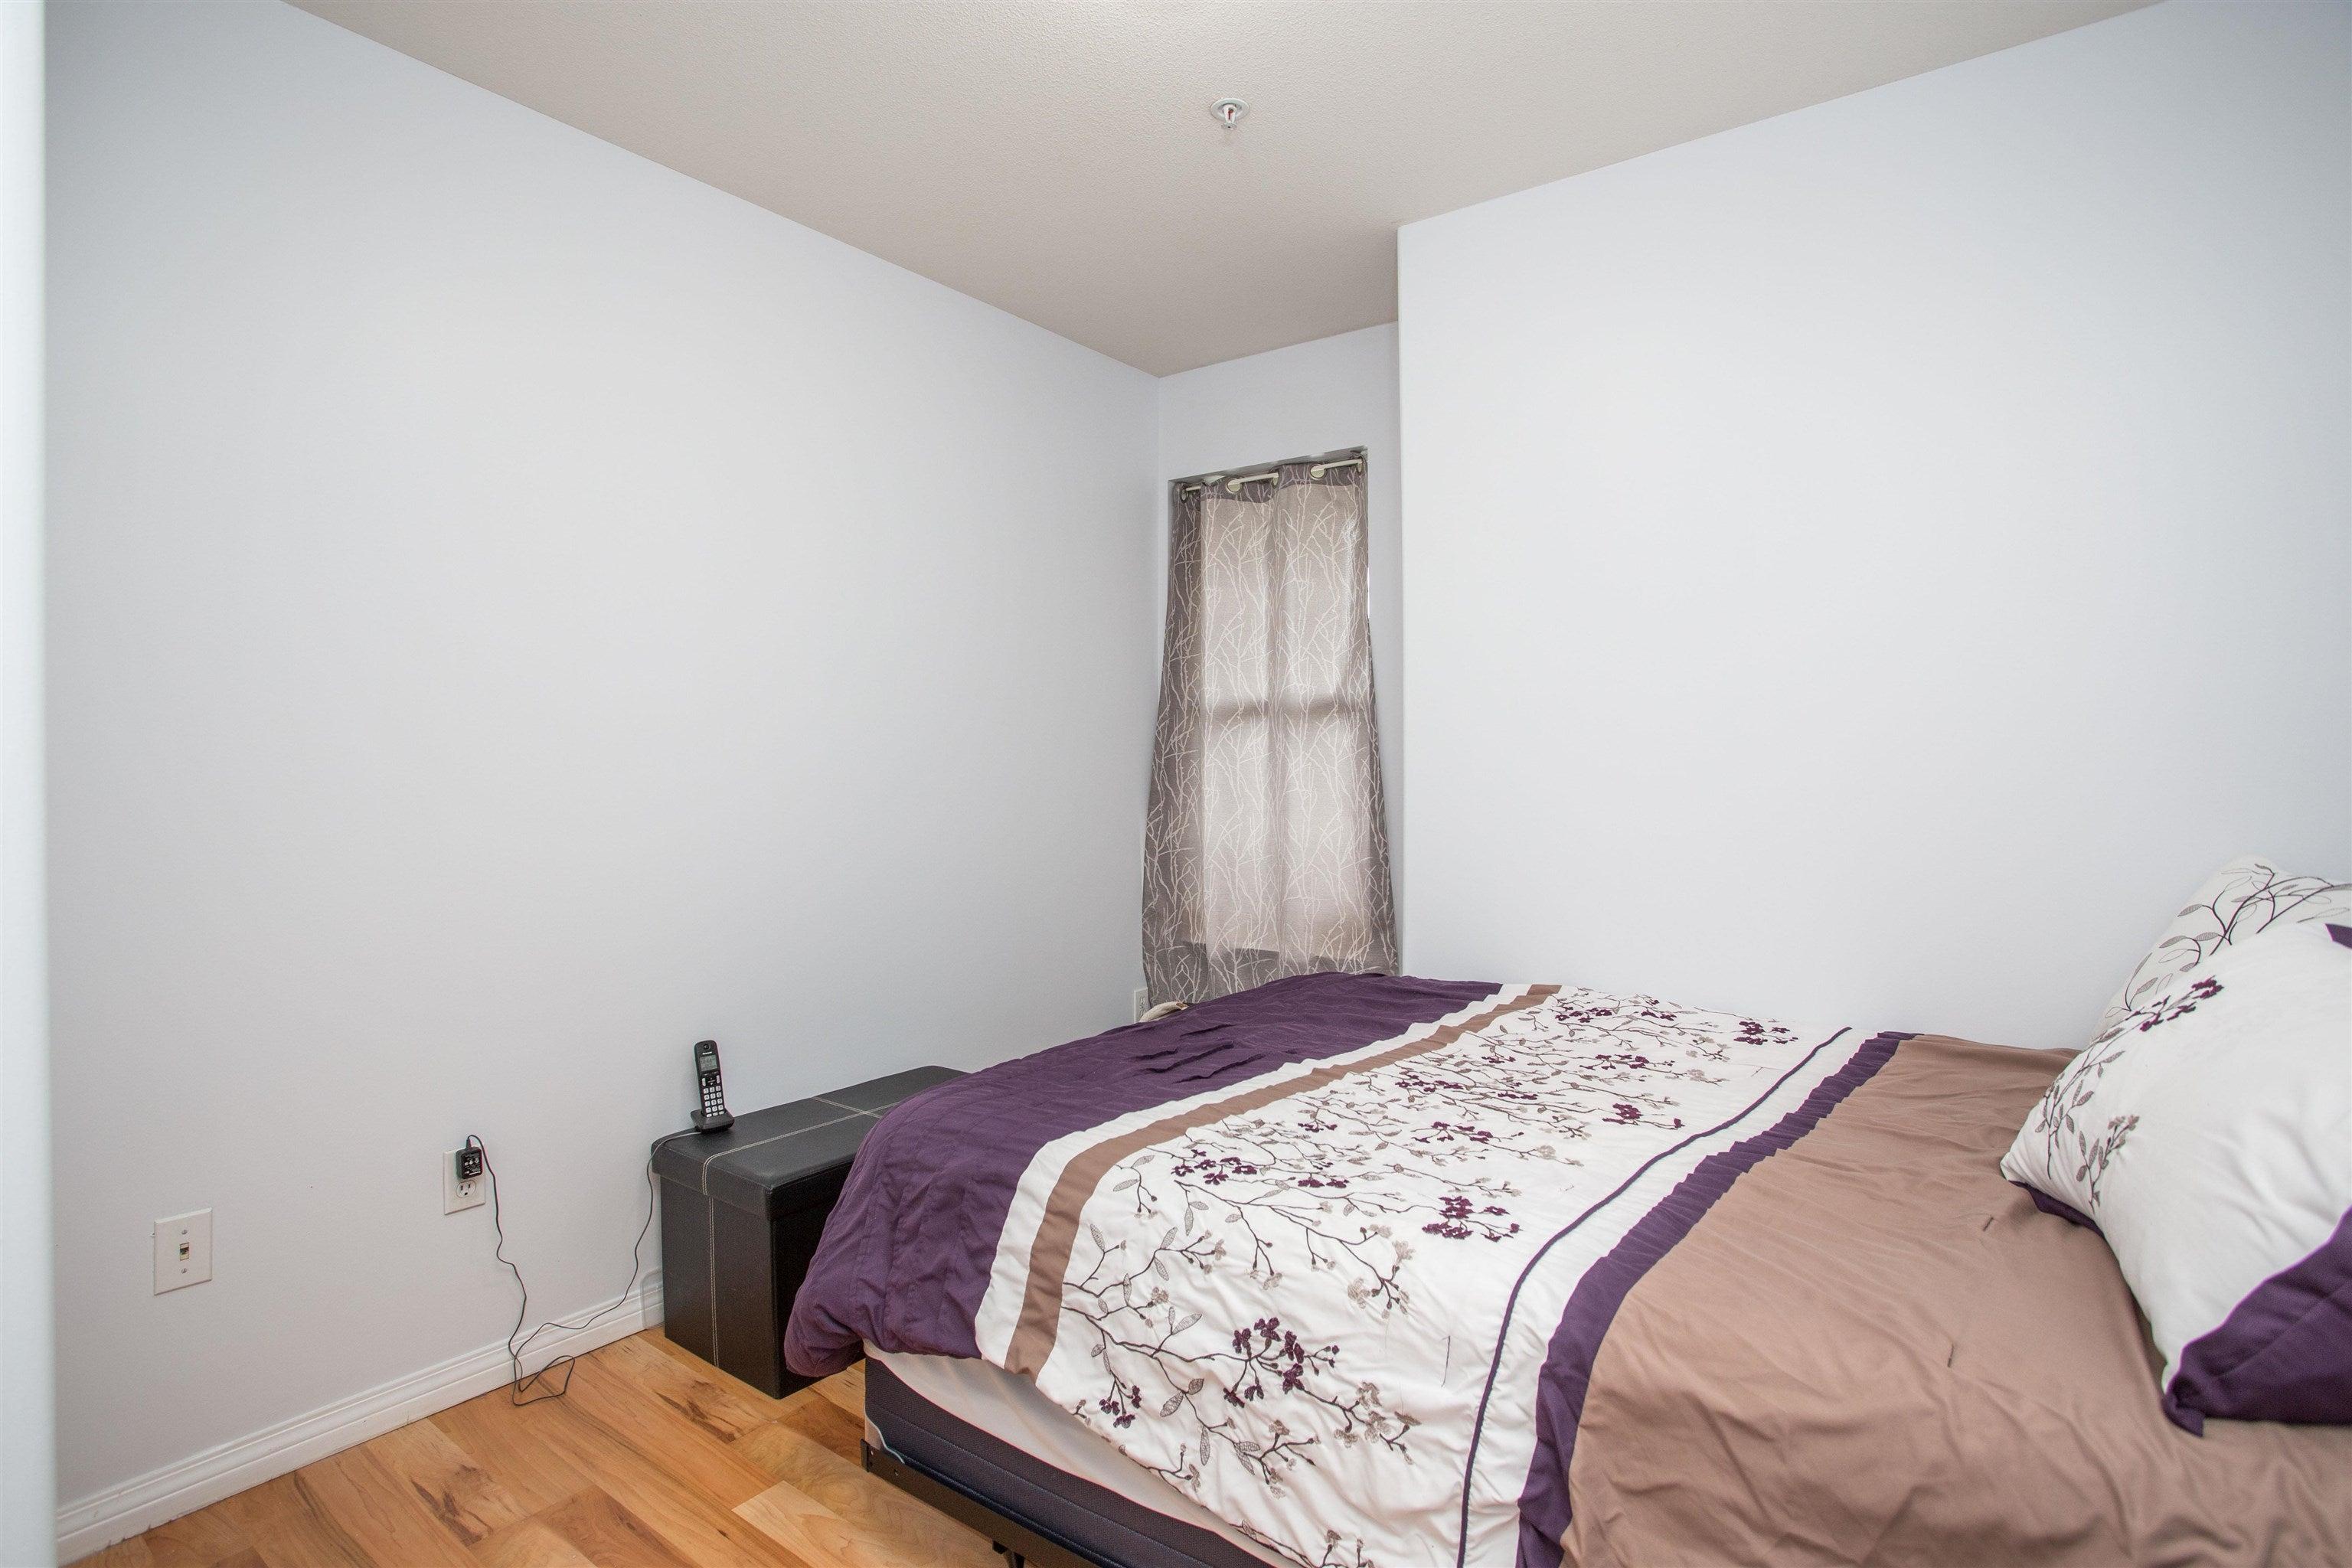 7 205 LEBLEU STREET - Maillardville Apartment/Condo for sale, 3 Bedrooms (R2625671) - #18